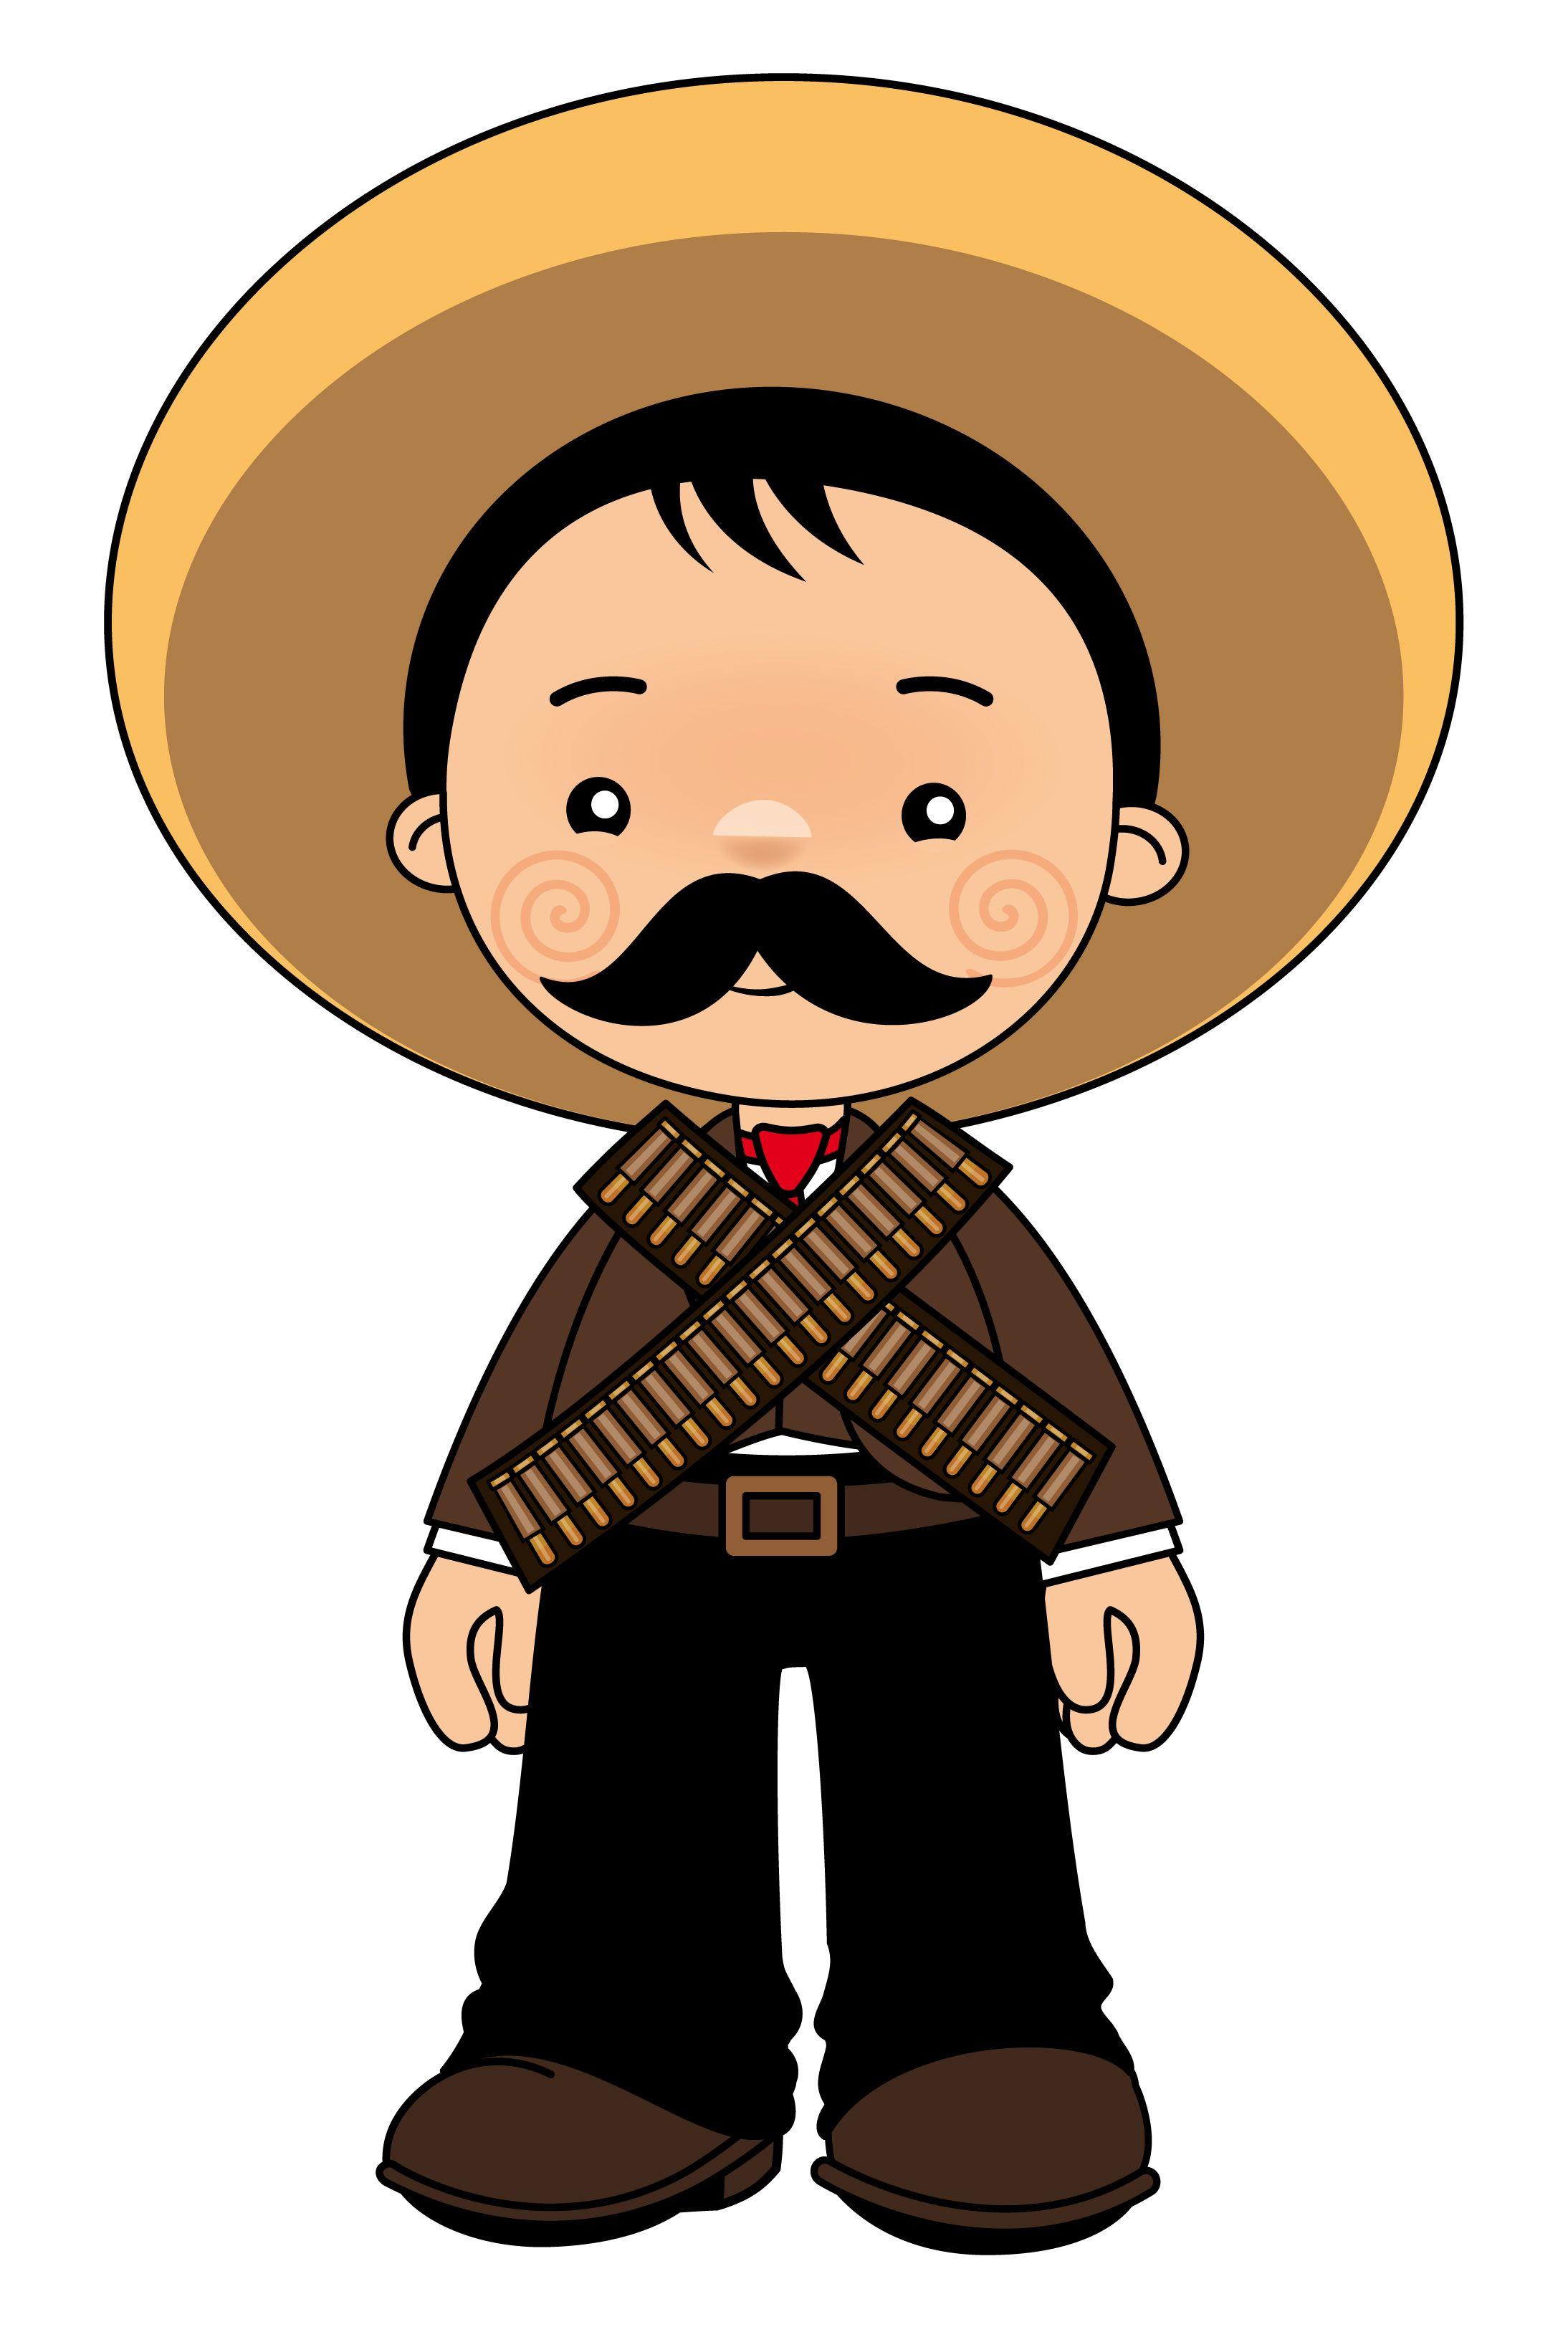 Emiliano Zapata 2 Revolucion Mexicana Para Ninos Revolucion